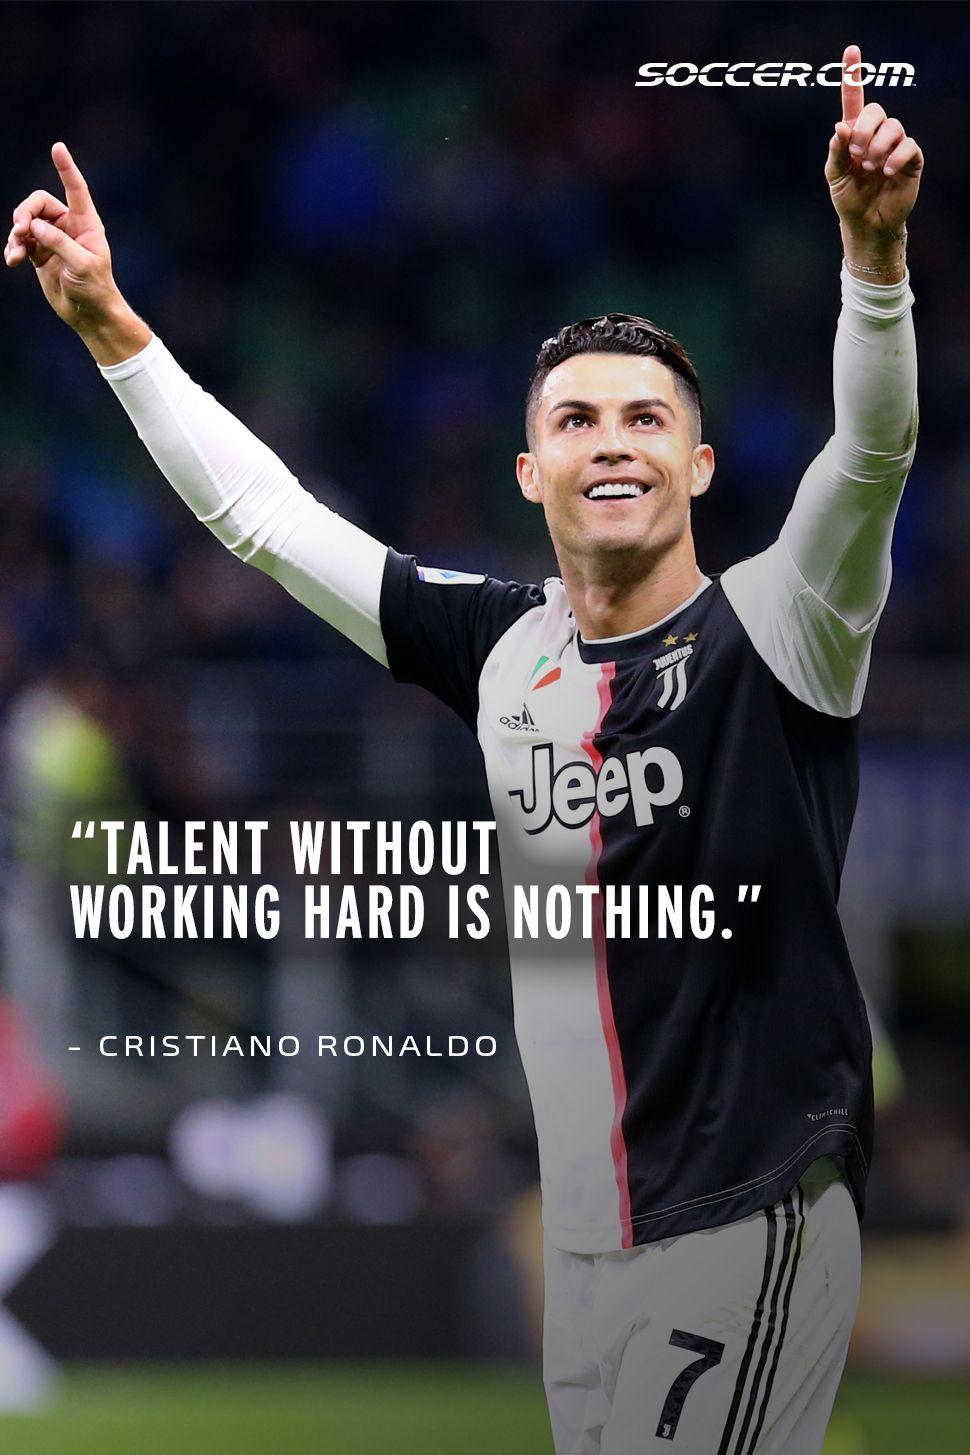 Best Inspirational Soccer Quotes Soccer Com Ronaldo Quotes Motivational Soccer Quotes Soccer Quotes